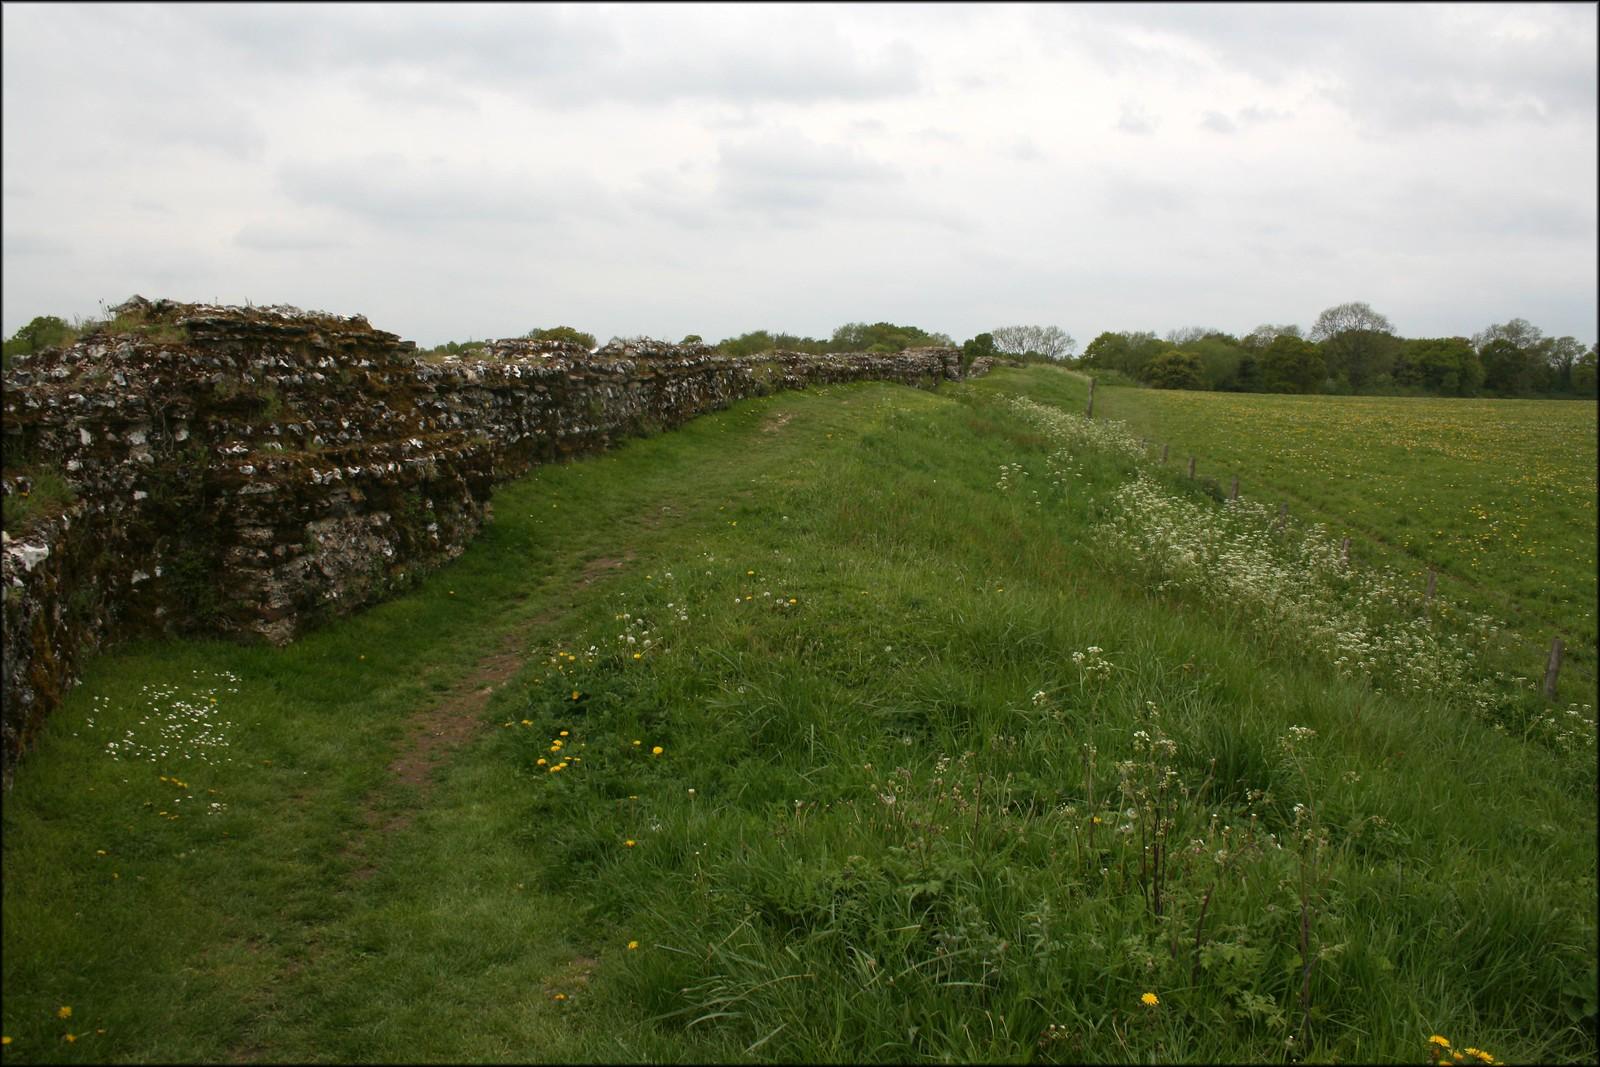 Old Roman Wall at Calleva Atrebatvm